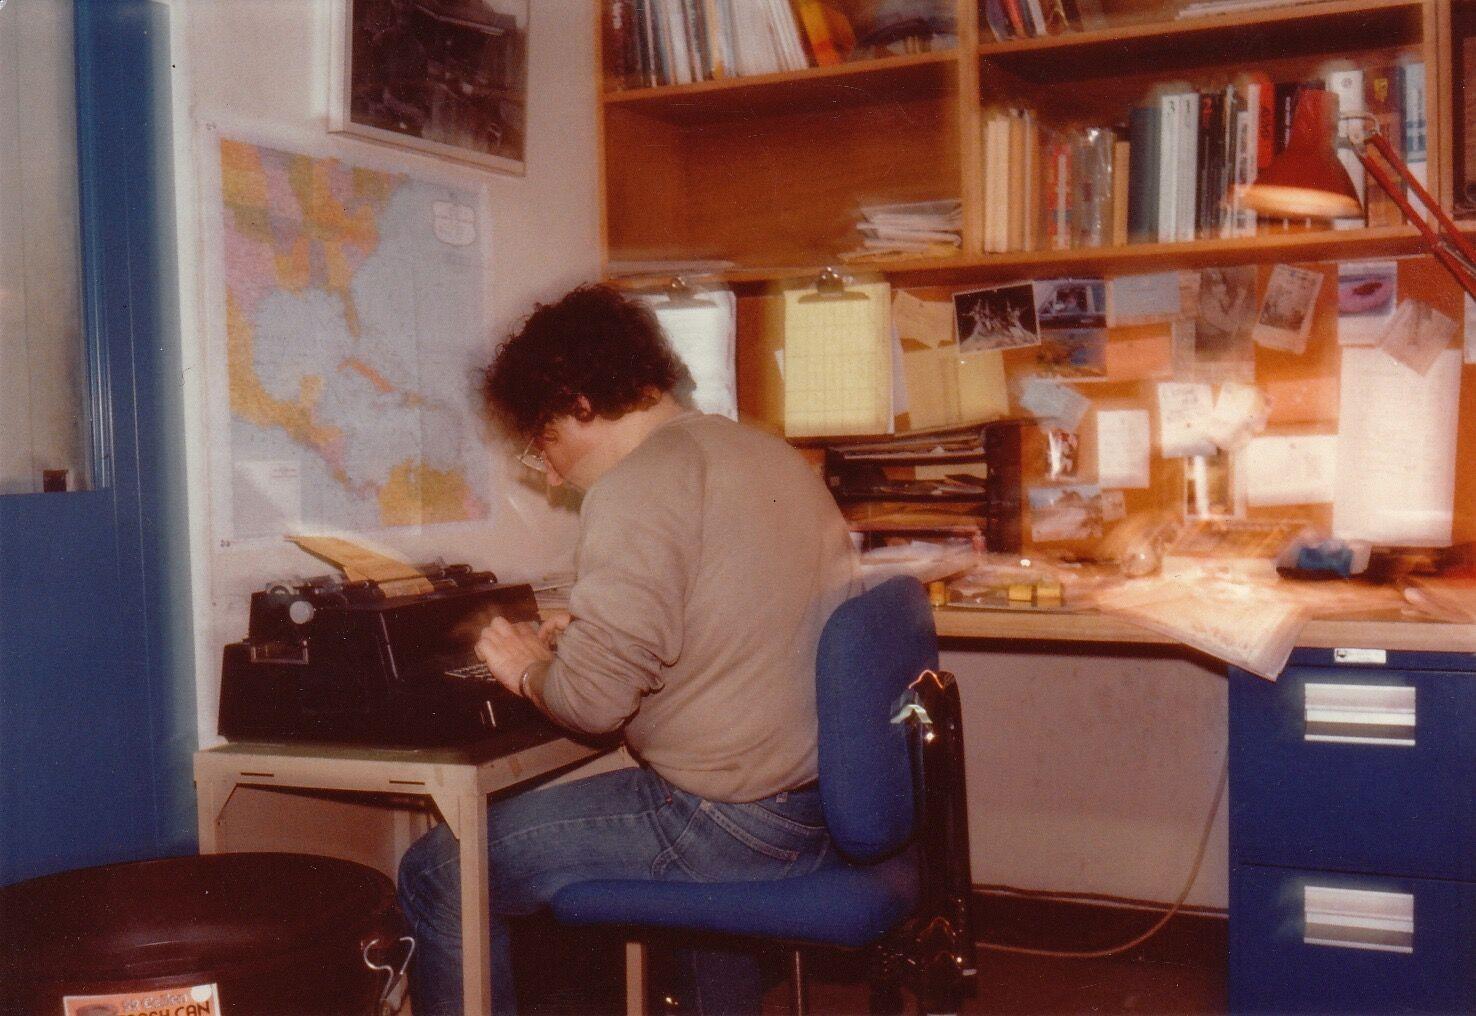 Robert_Dannin, Sygma office, NYC, ca. 1983. Photo by Gérard Rancinan.